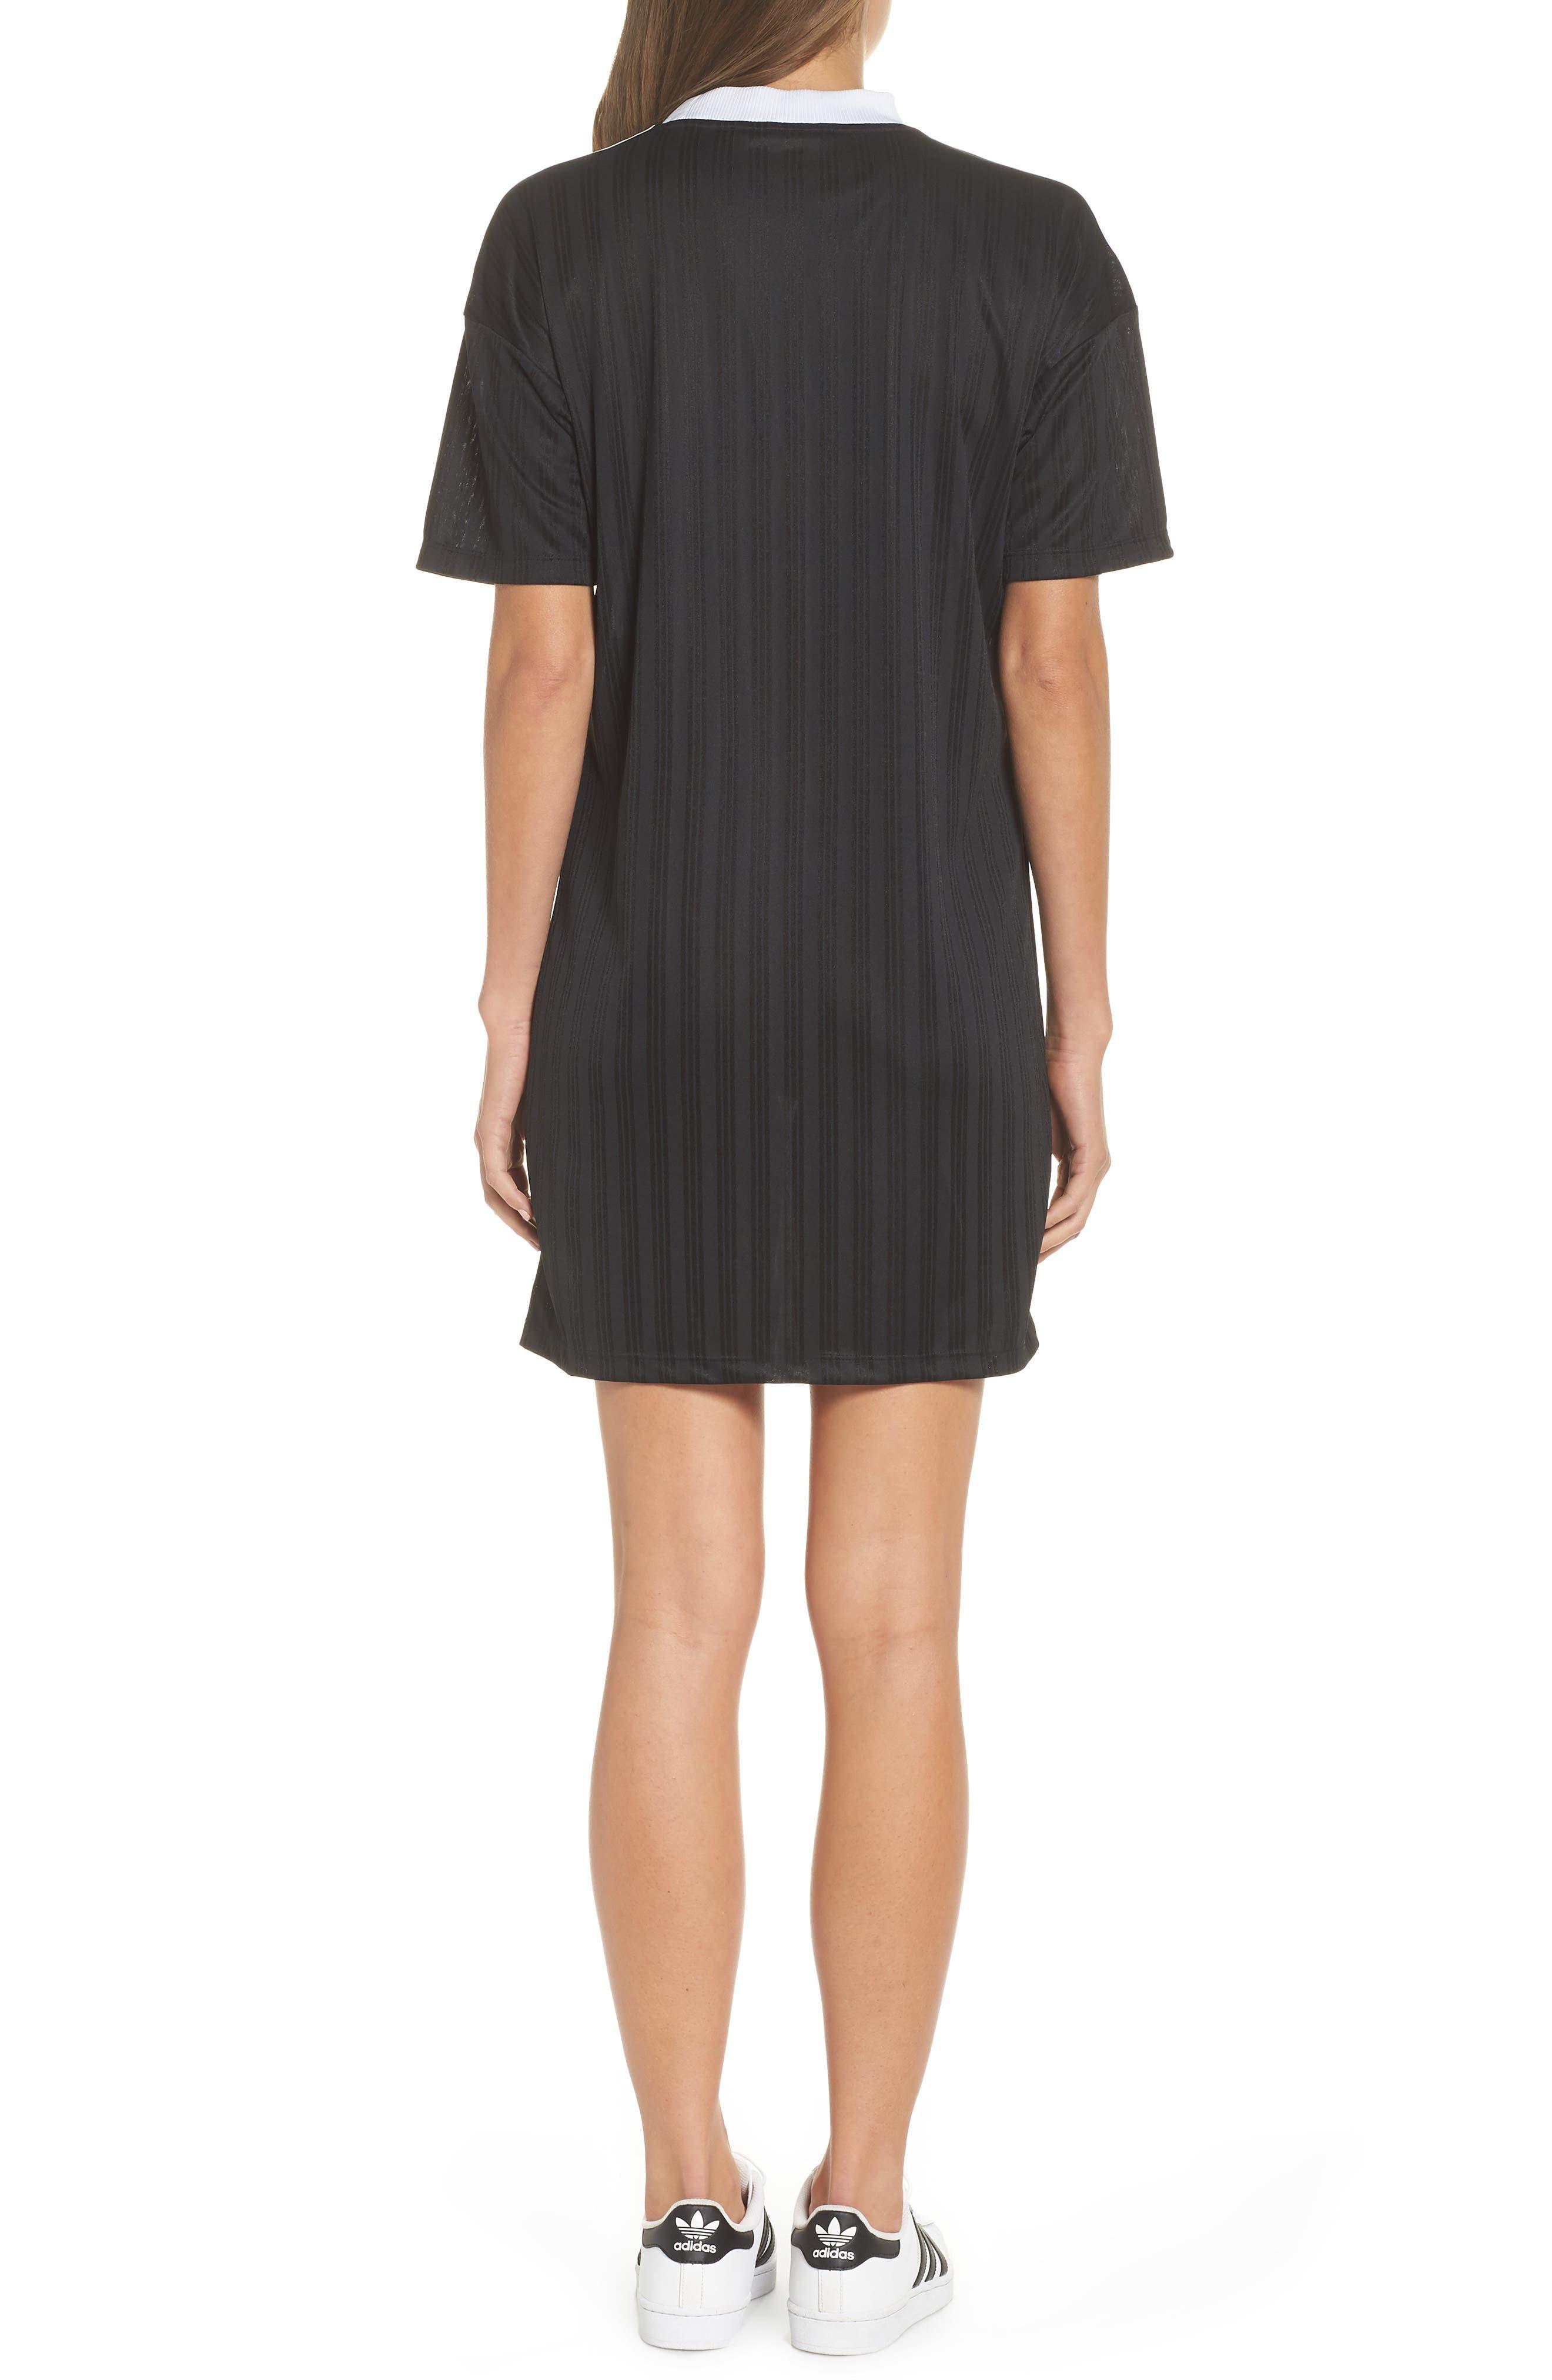 ADIDAS ORIGINALS,                             Trefoil T-Shirt Dress,                             Alternate thumbnail 2, color,                             001